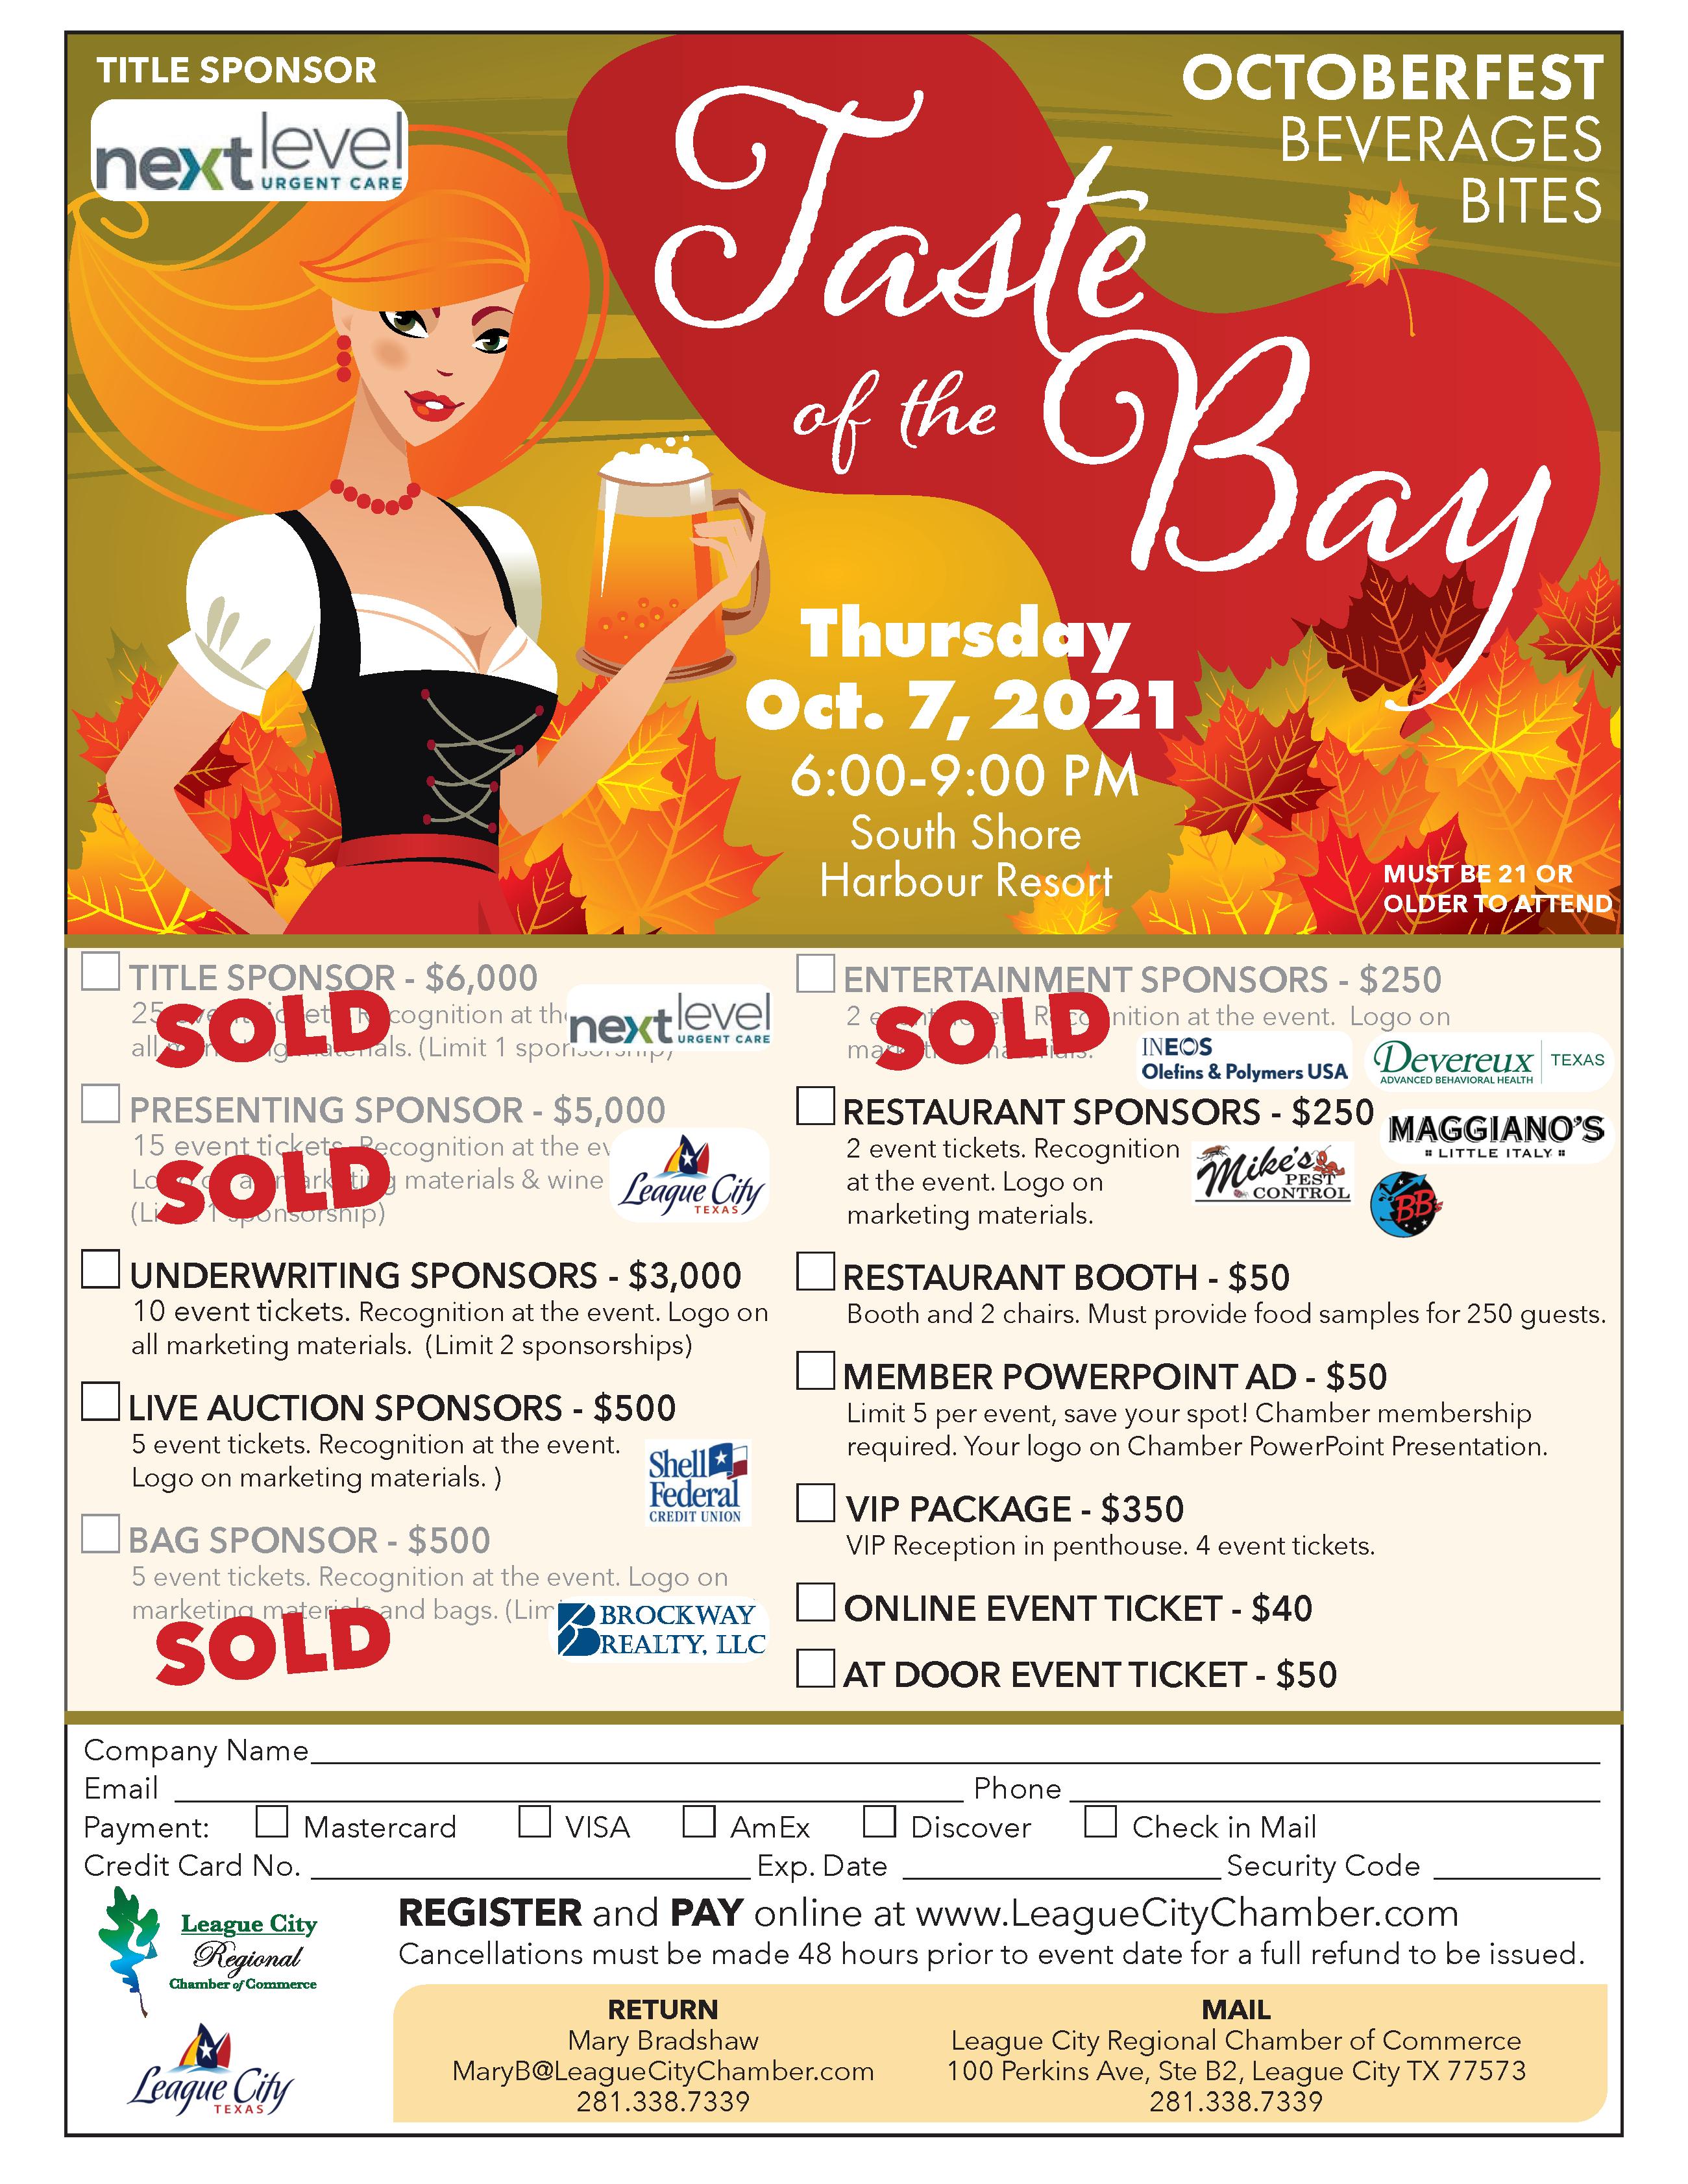 Image for League City Regional Chamber Prepares for Taste of the Bay Oktoberfest!